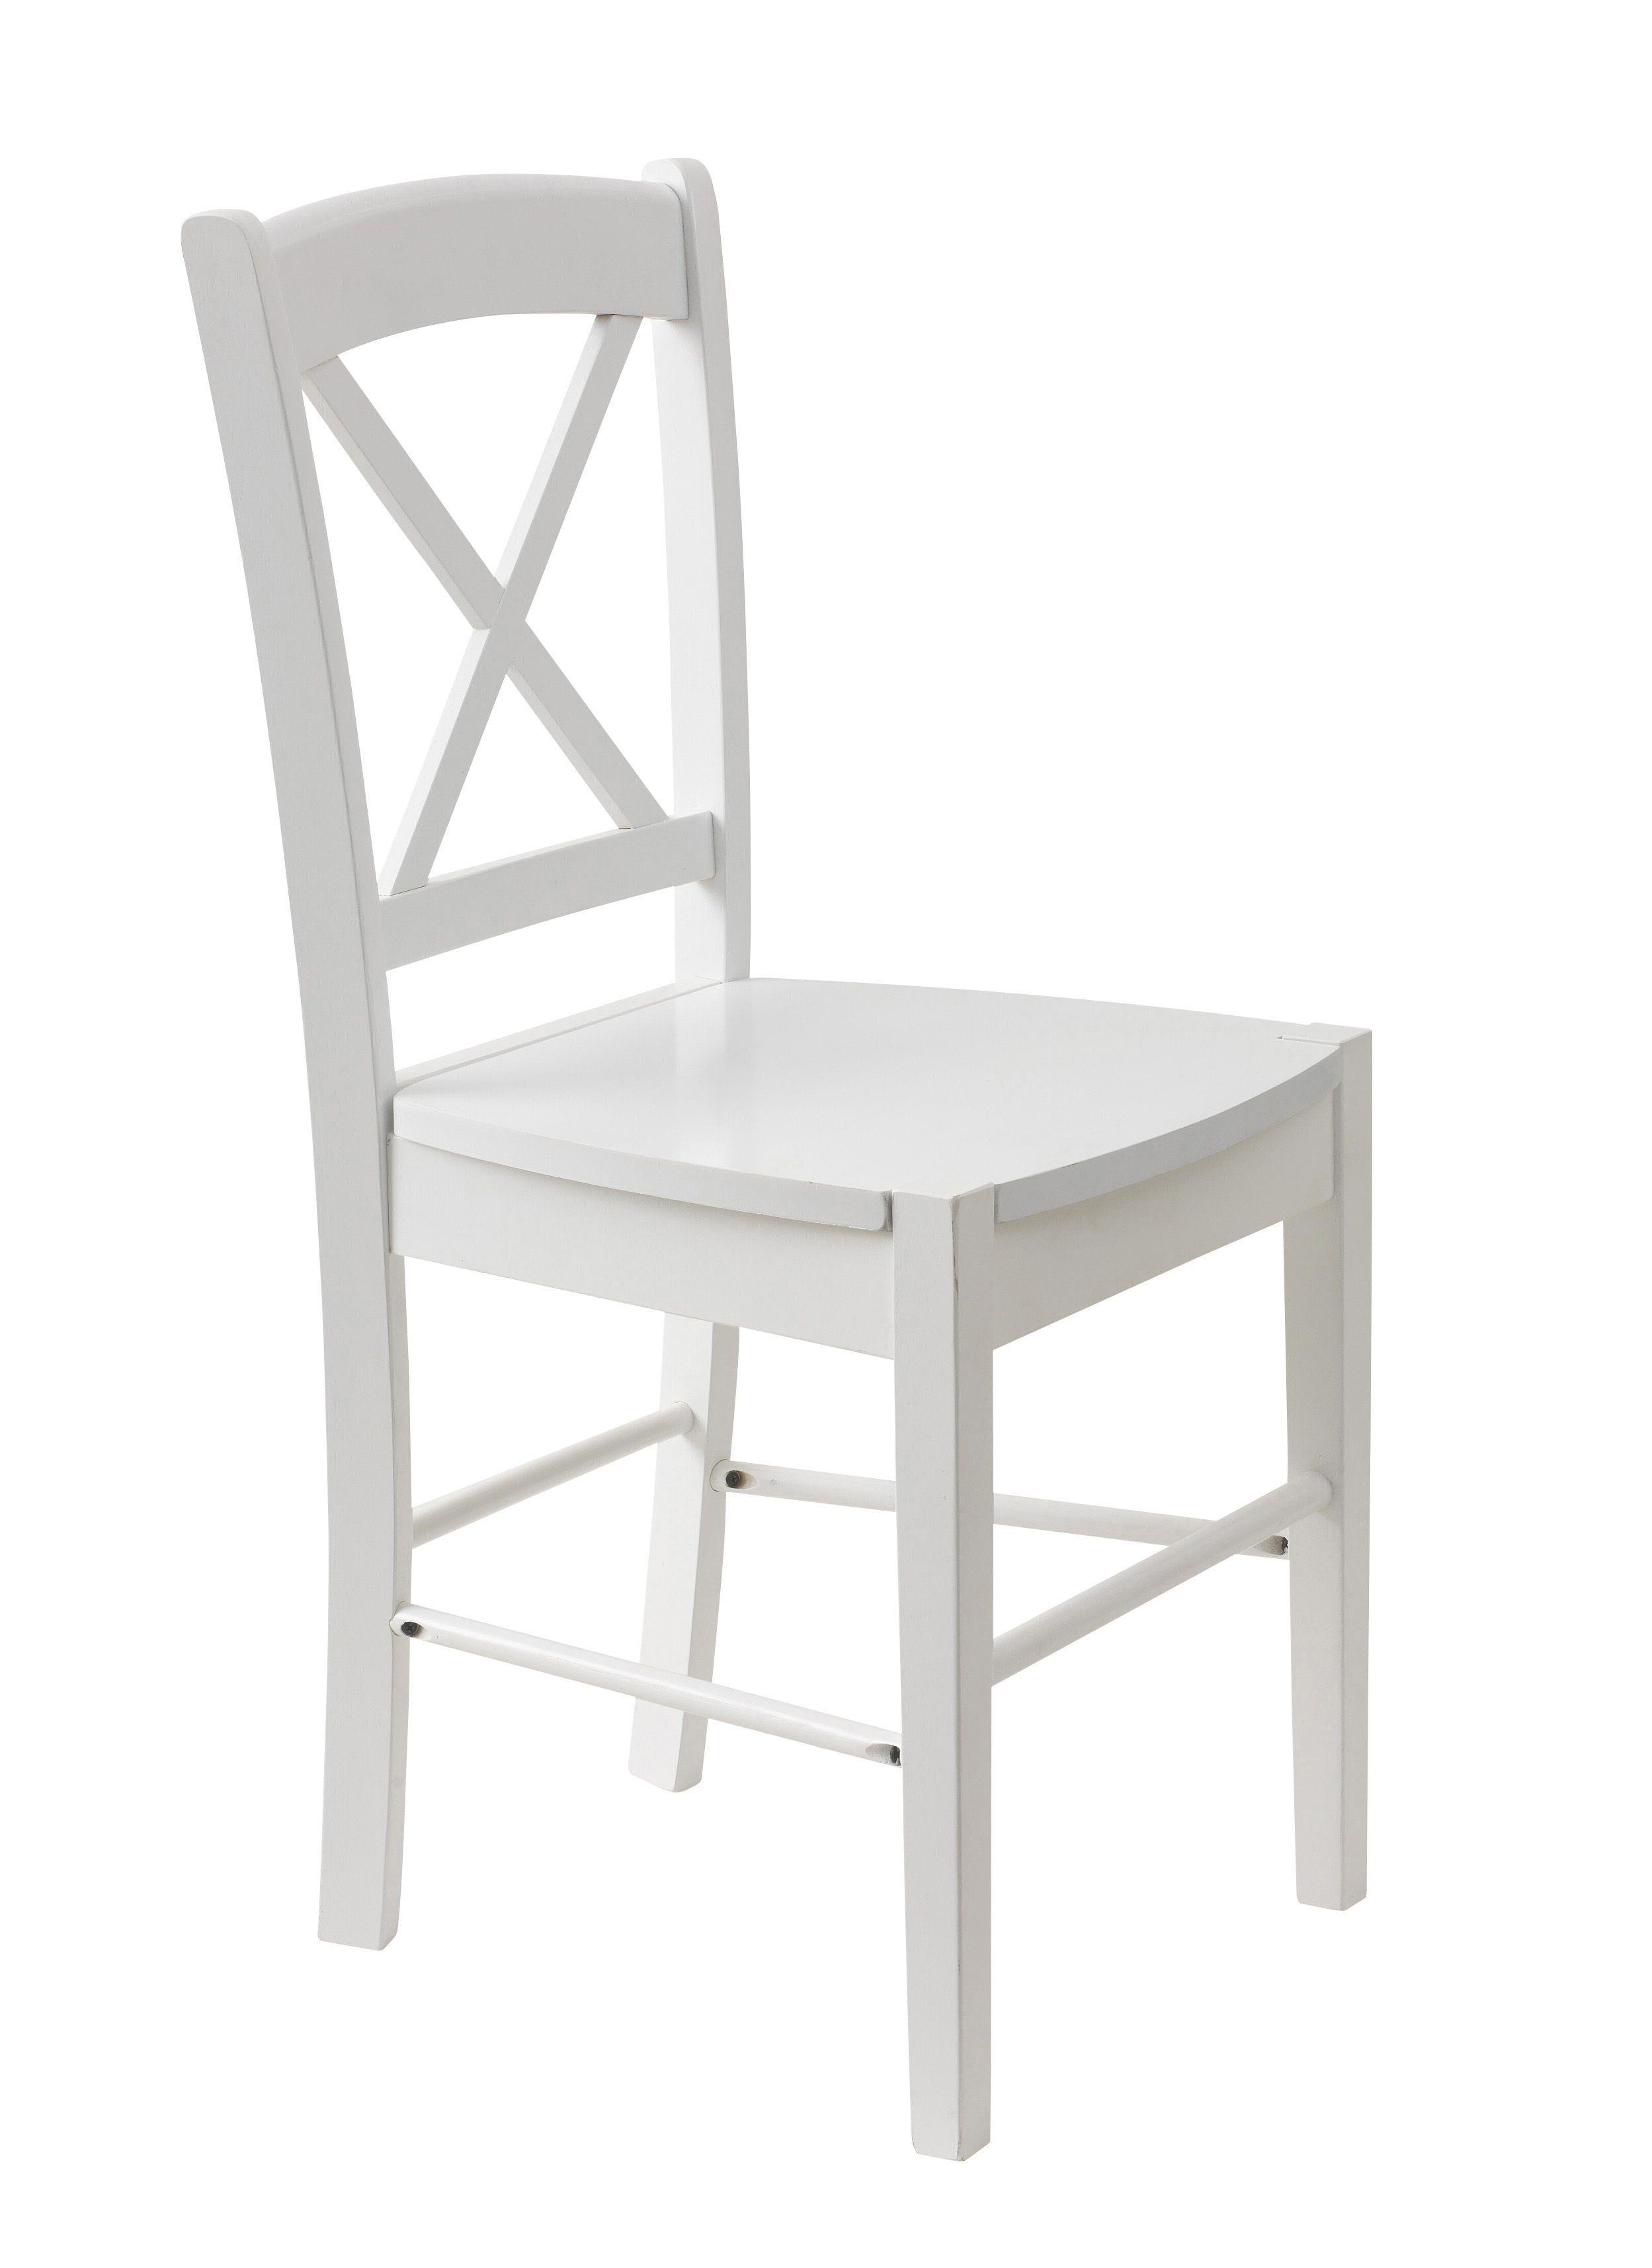 Silla madera blanca silla muebles dormitorio living for Silla blanca patas madera ikea